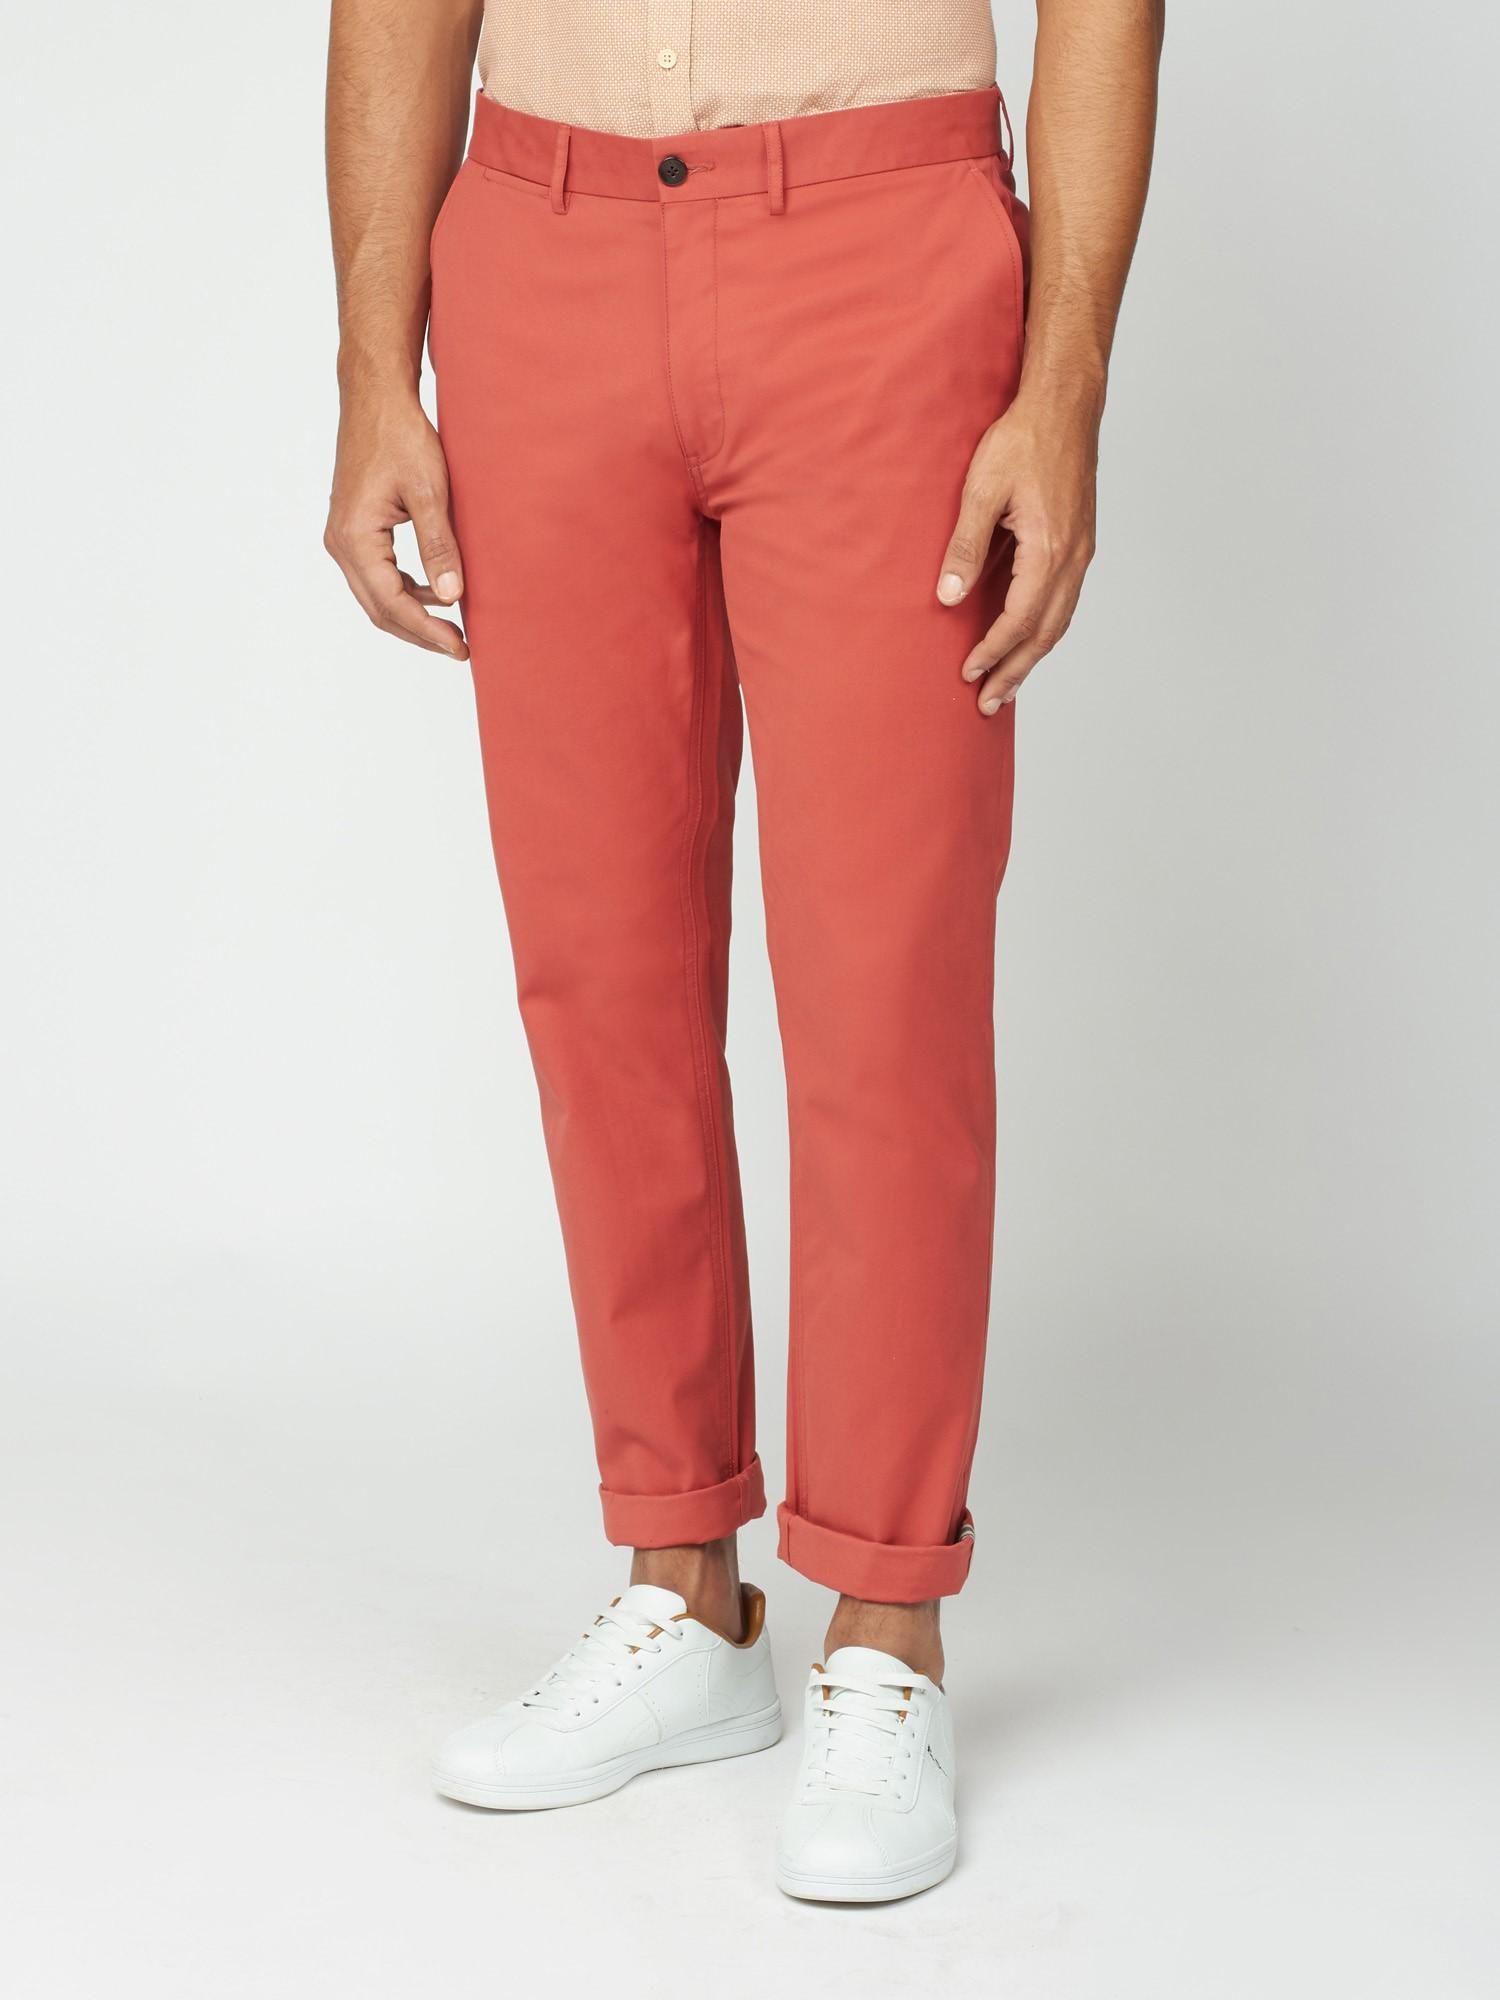 Teracotta Red Slim Stretch Cotton Chinos